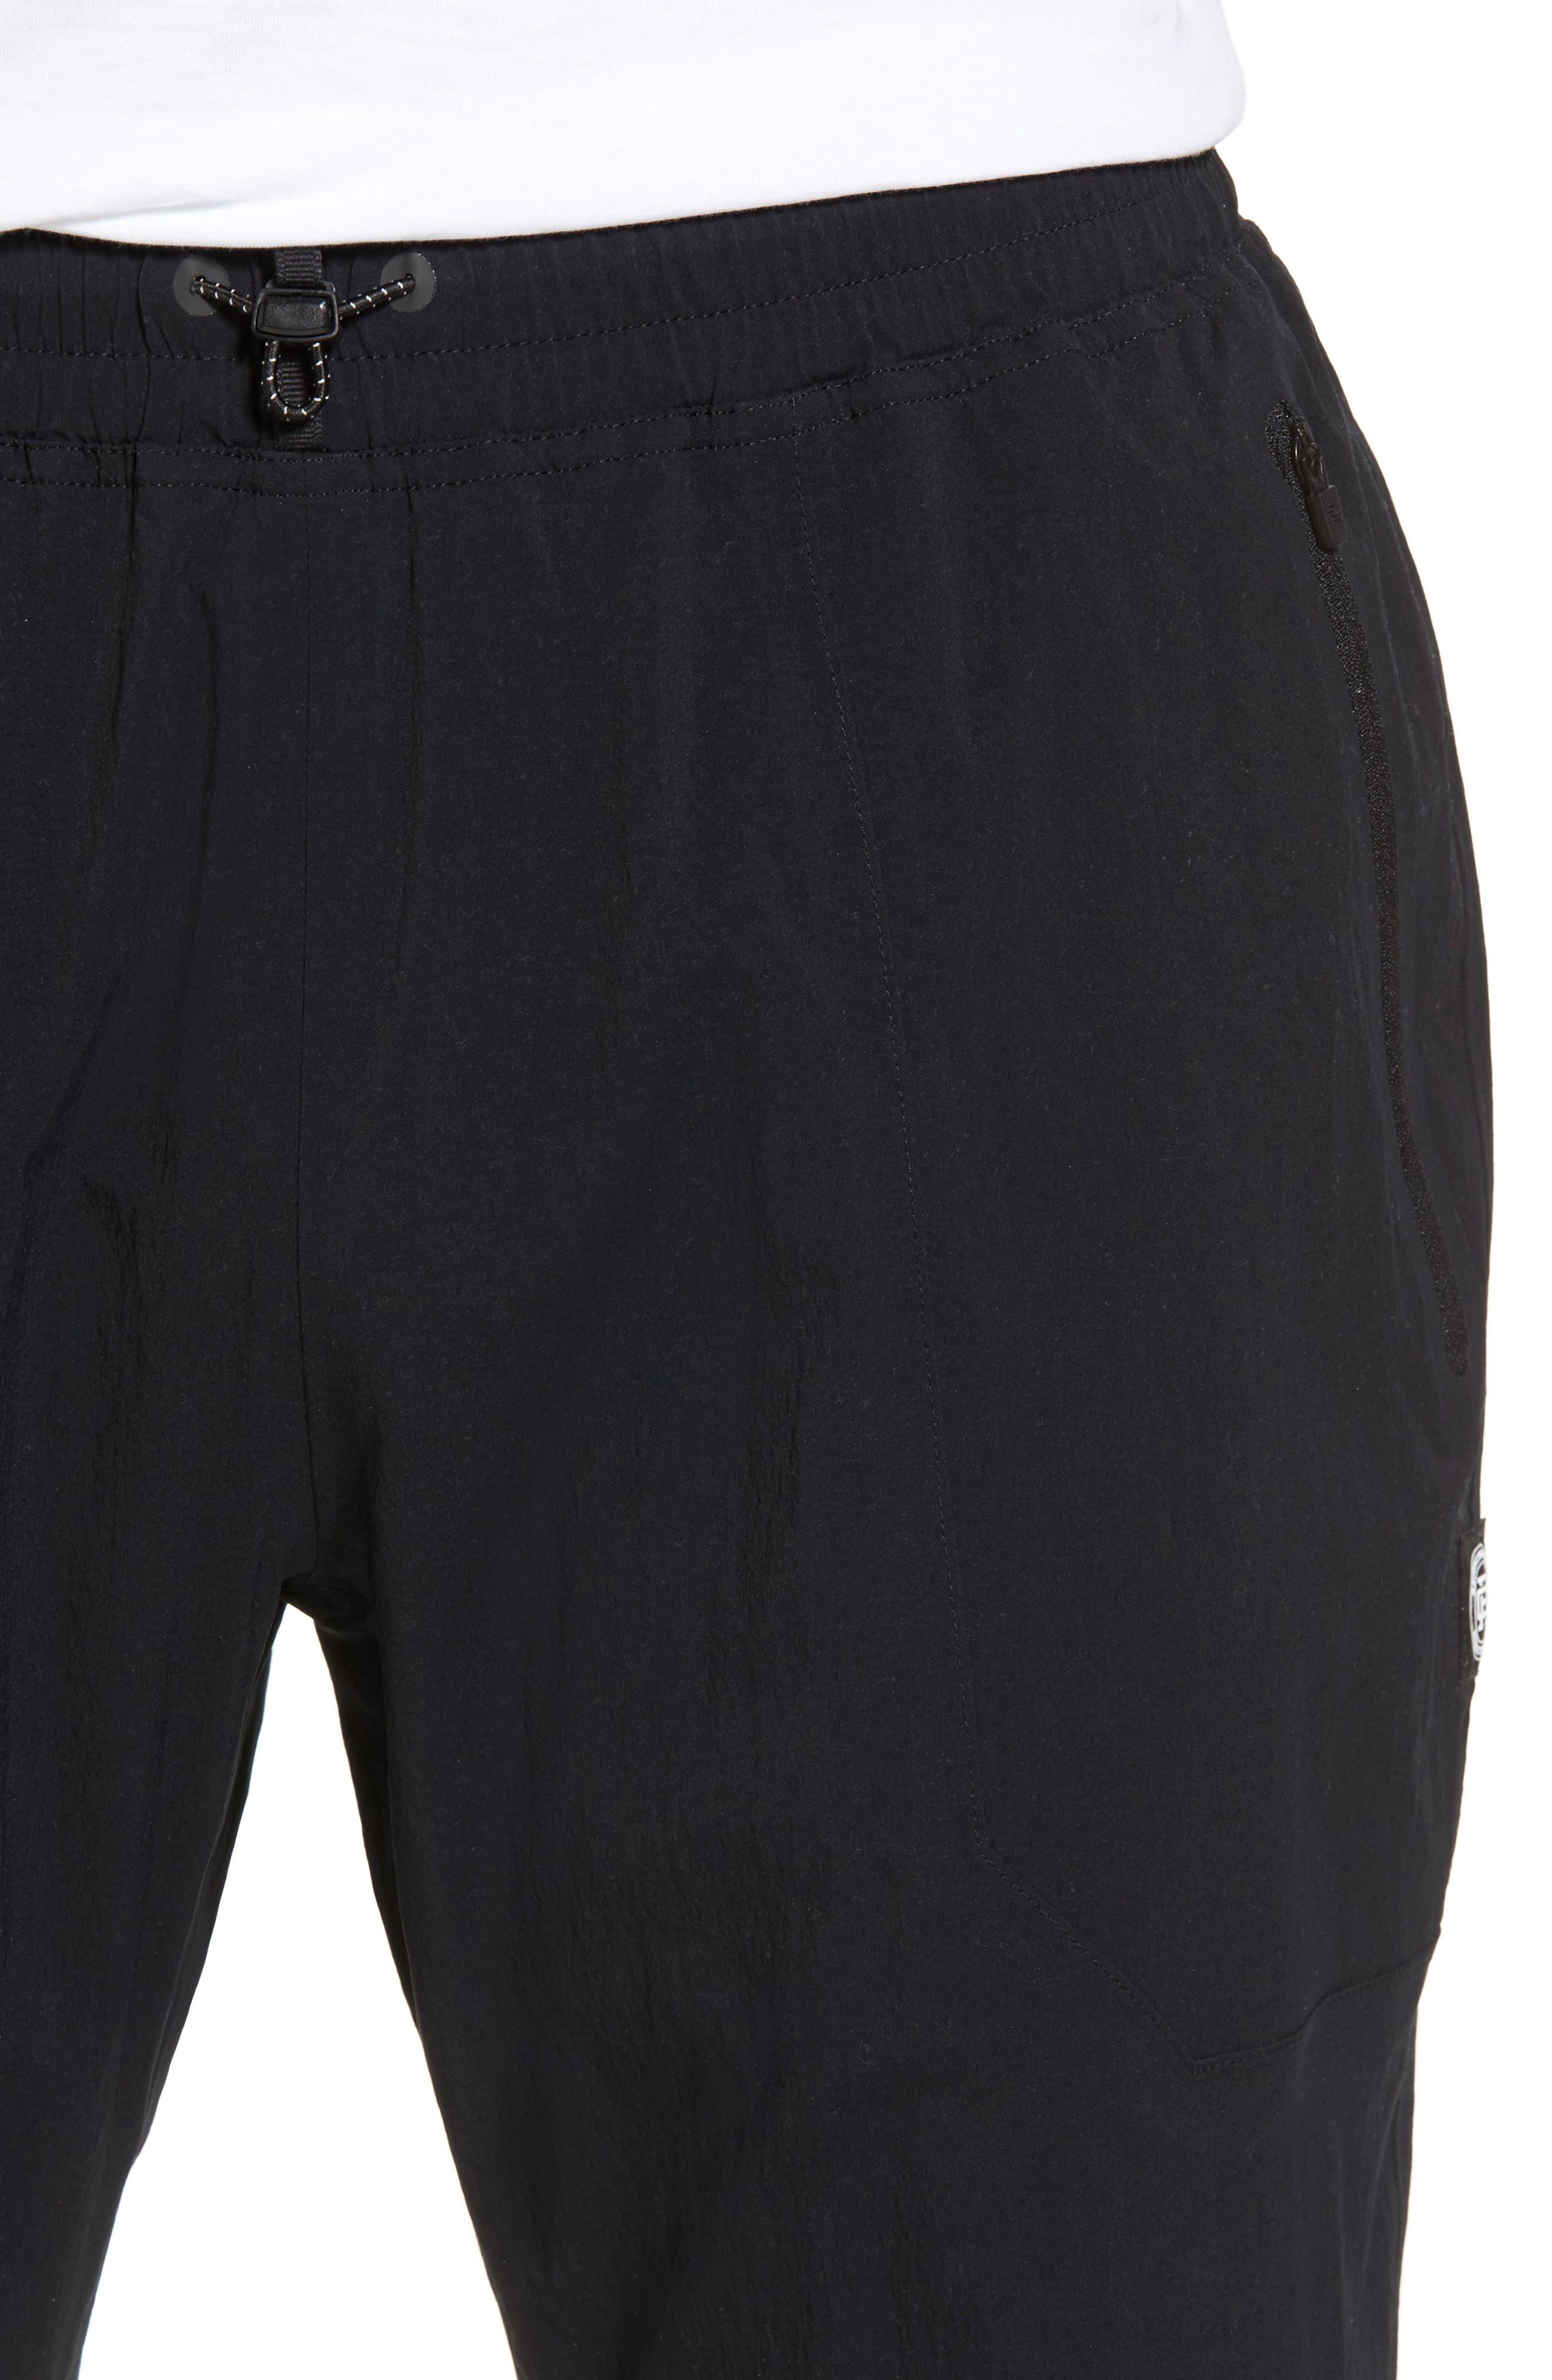 N279 Sweatpants,                             Alternate thumbnail 4, color,                             Black